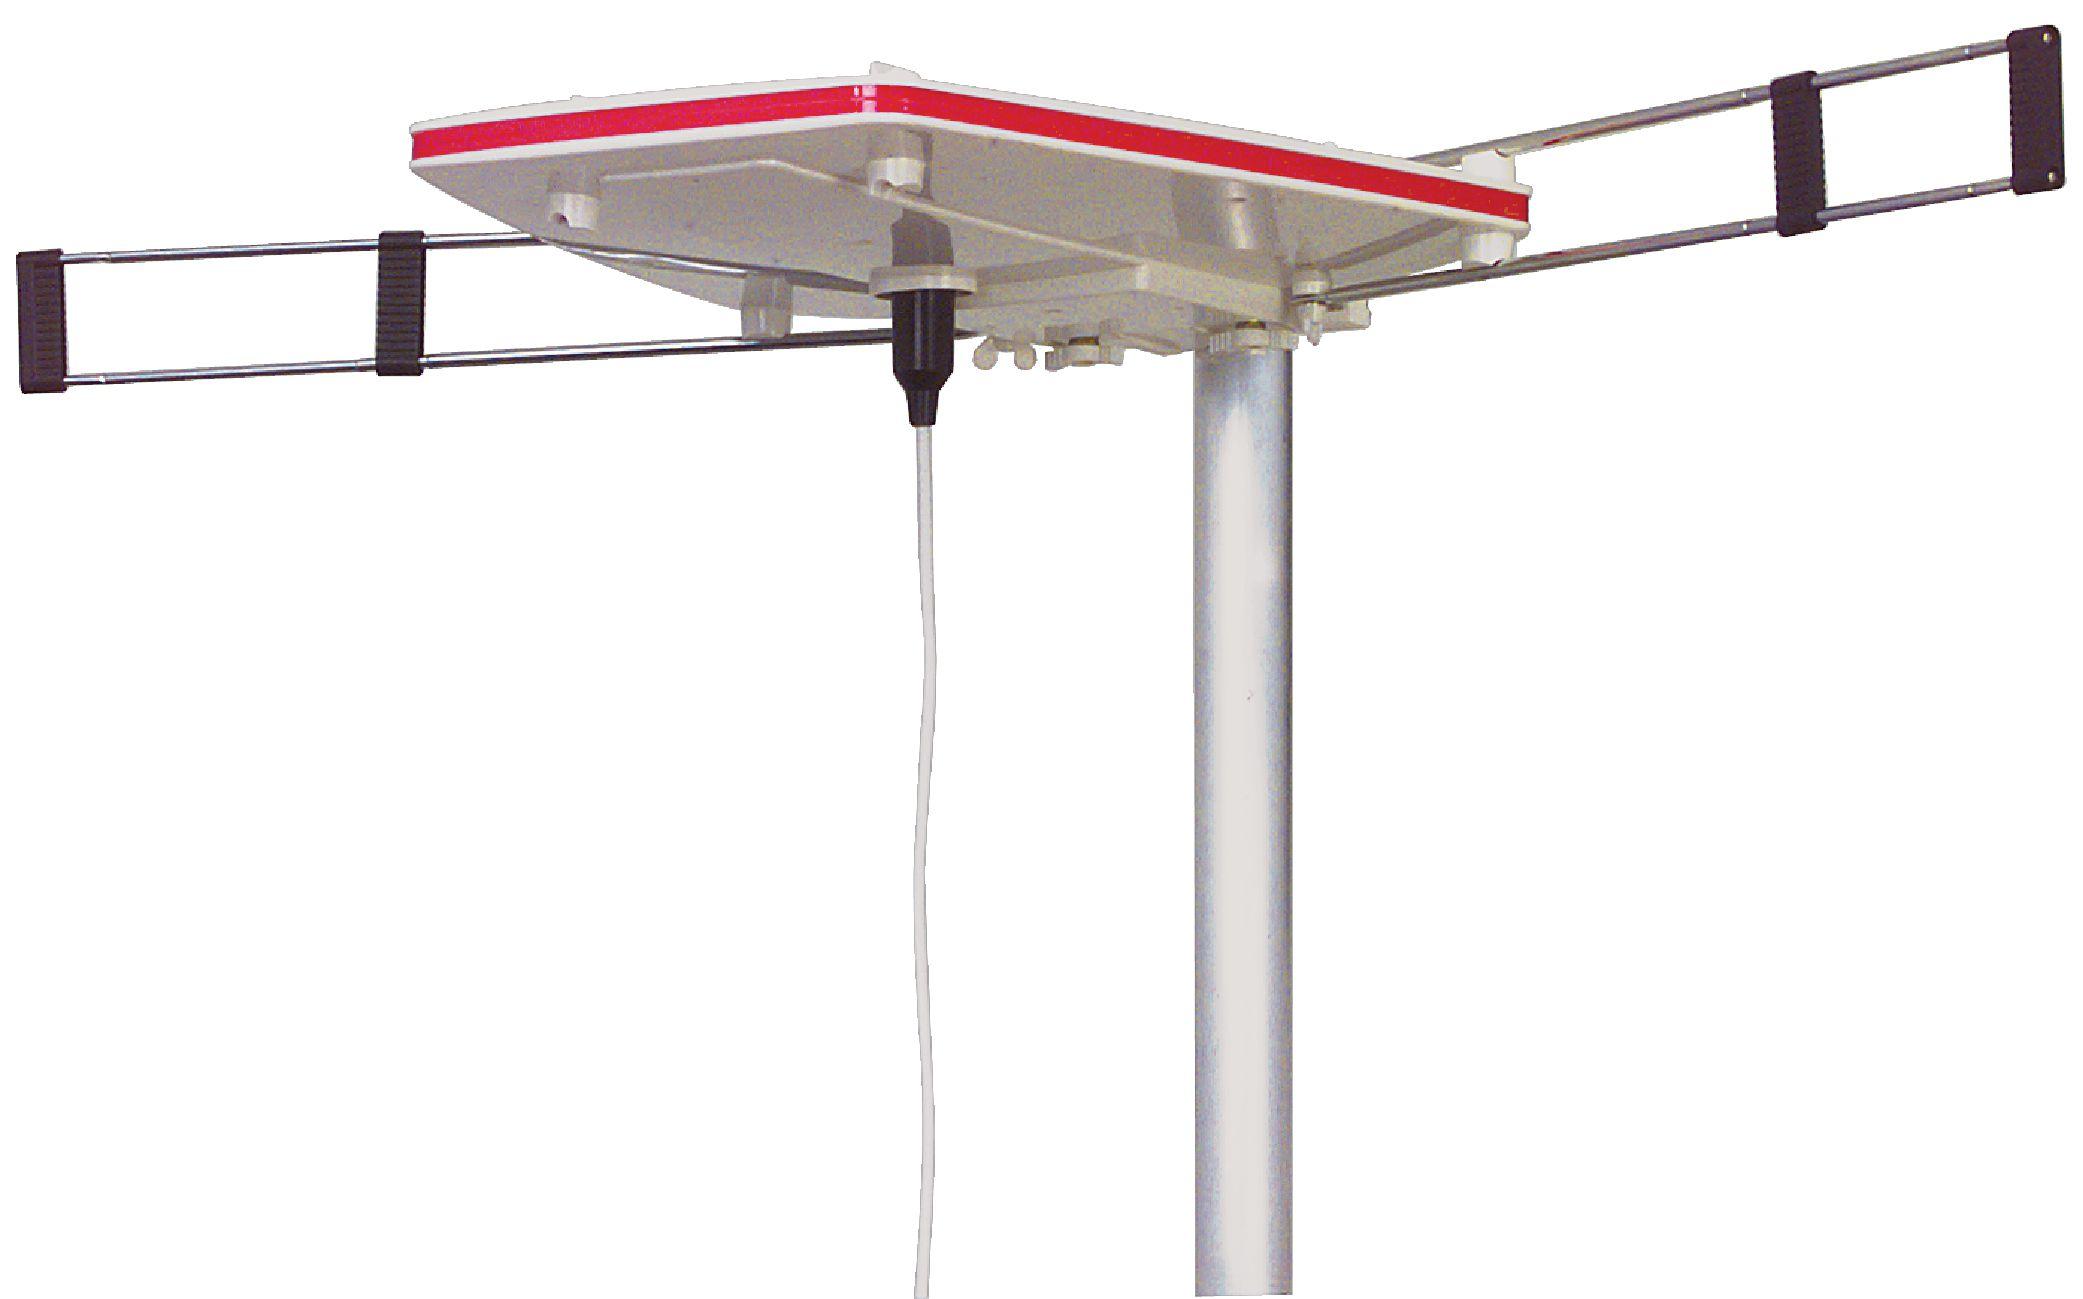 Anténa pro karavan FM/VHF/UHF DVB-T/T2-DAB+ 24 dB, König KN-ANT-CAMP